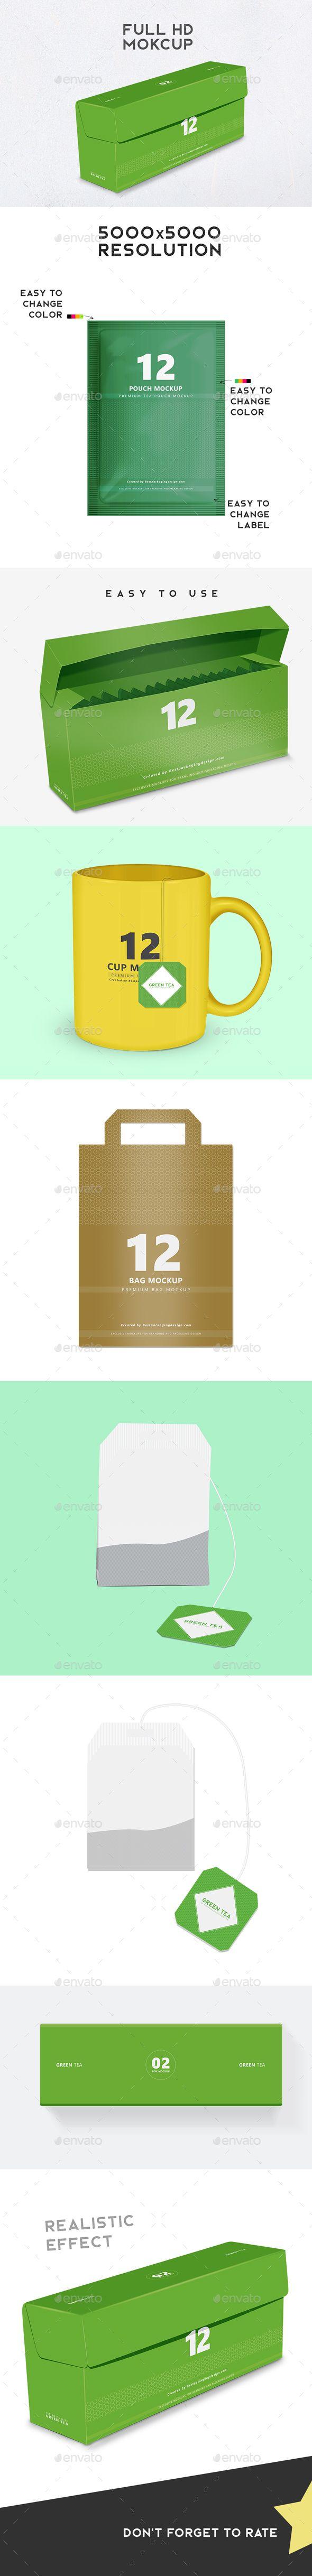 Download Green Tea Packaging Mockup A 20showcase Your Work On This Green Tea Packaging Mockup Premium Quality And In Tea Packaging Green Tea Detox Green Tea And Honey